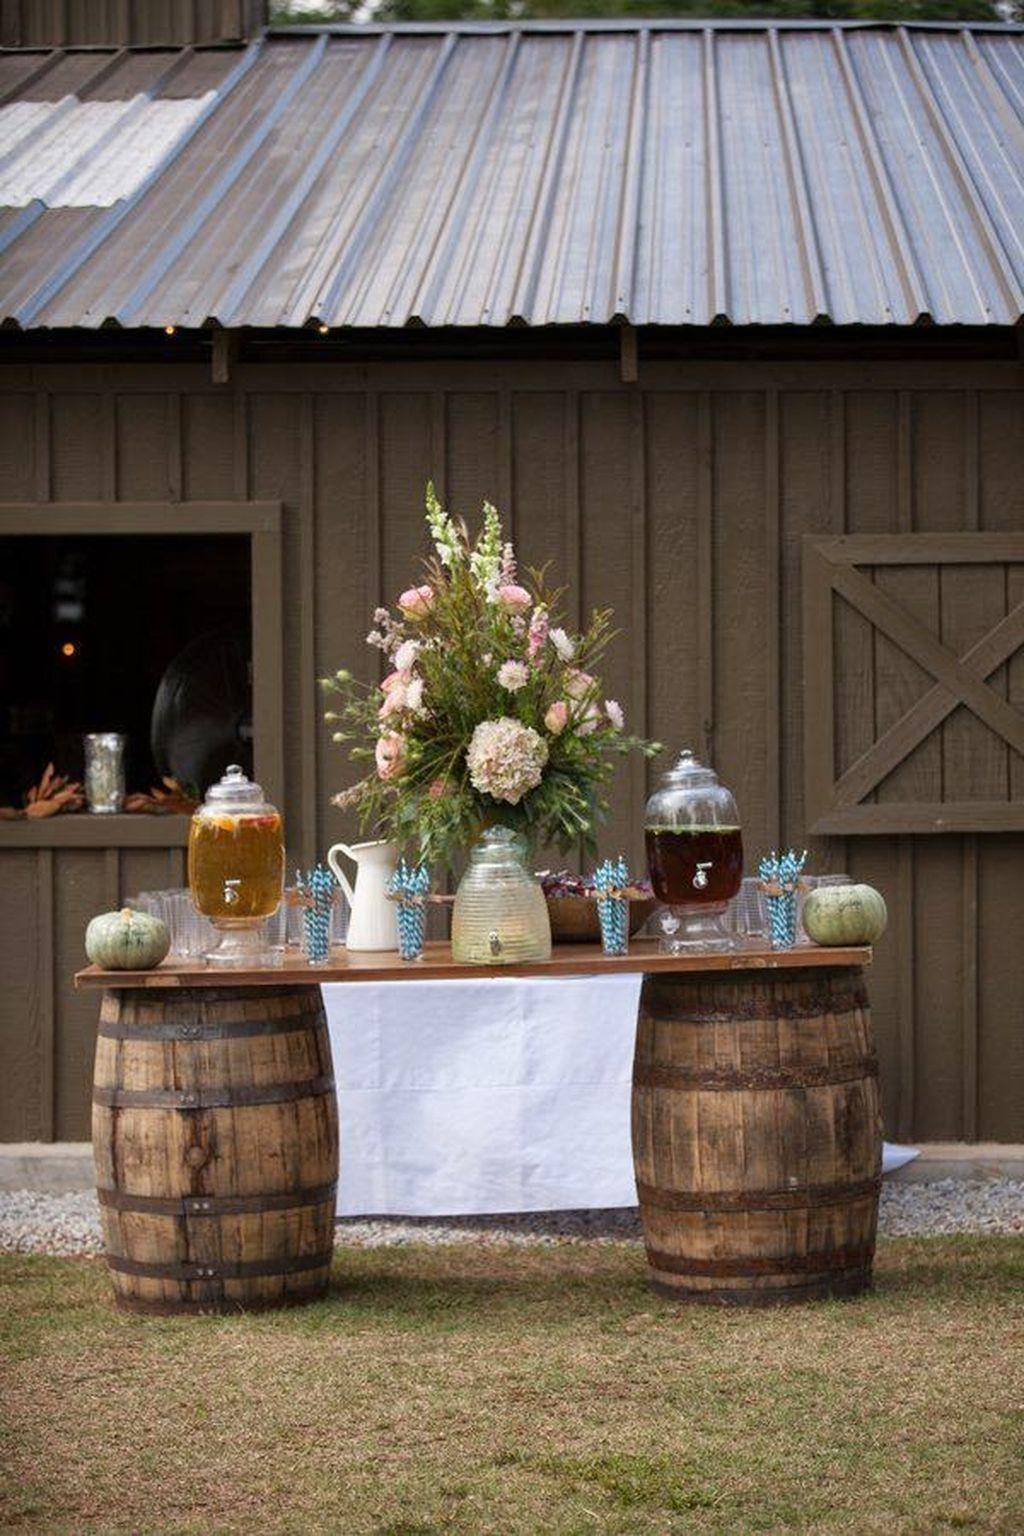 86 elegant rustic wedding decoration ideas 2017 elegant 86 elegant rustic wedding decoration ideas 2017 junglespirit Image collections